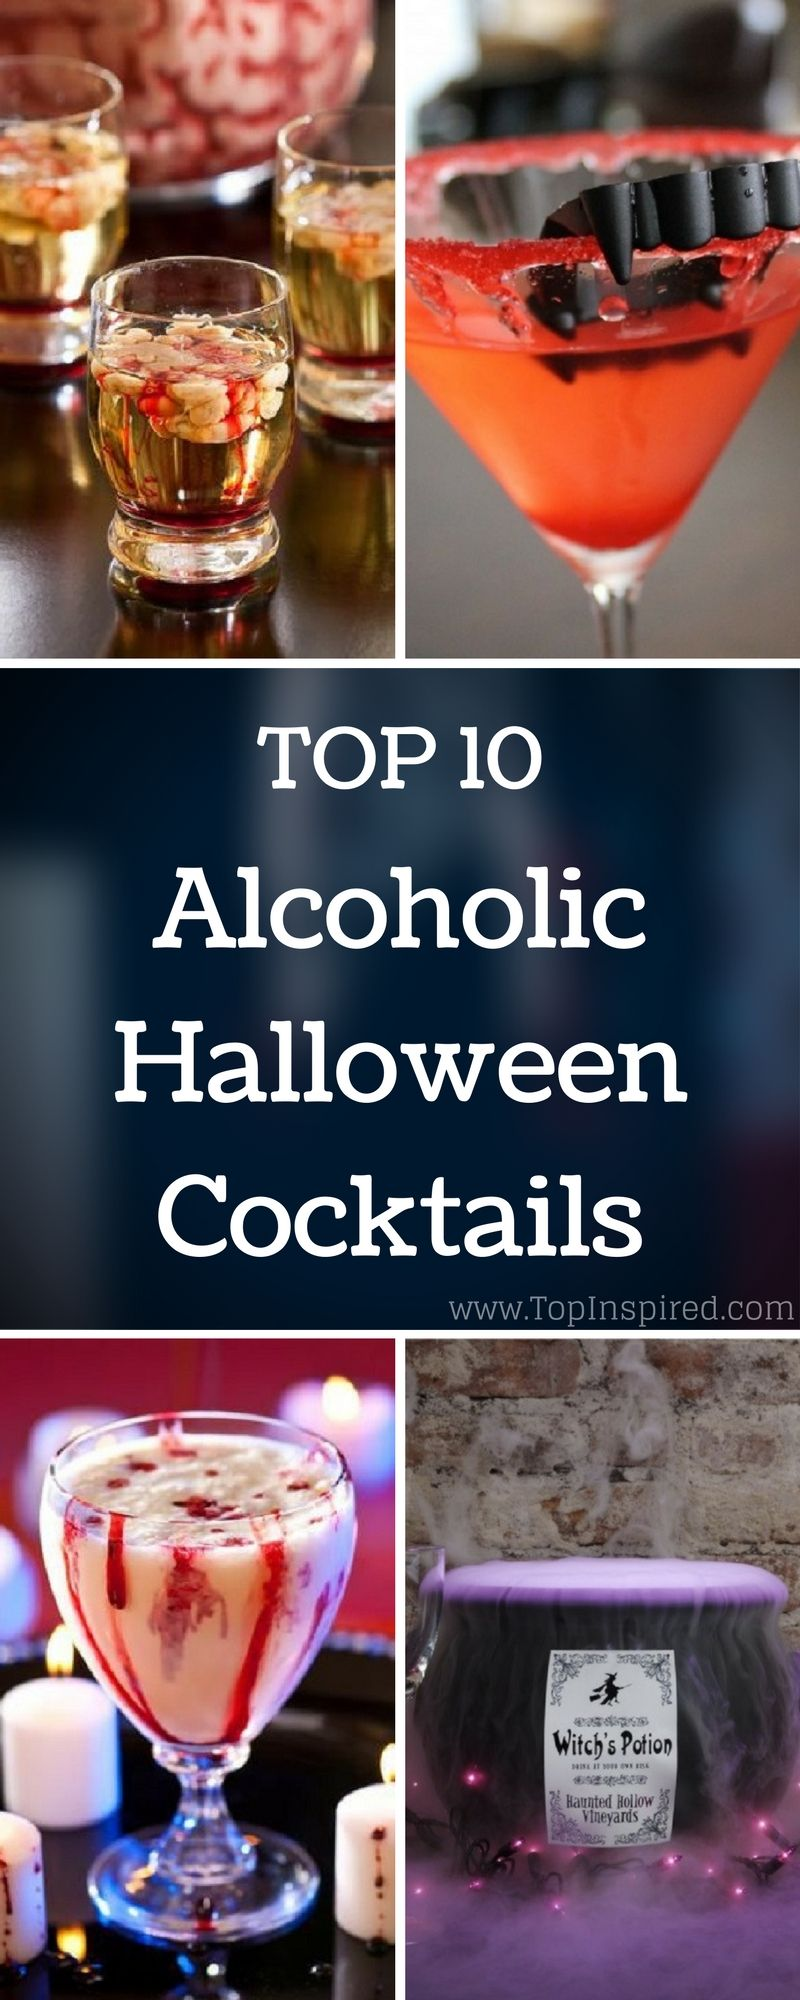 Top 10 Alcoholic Halloween Cocktails Halloween Cocktails